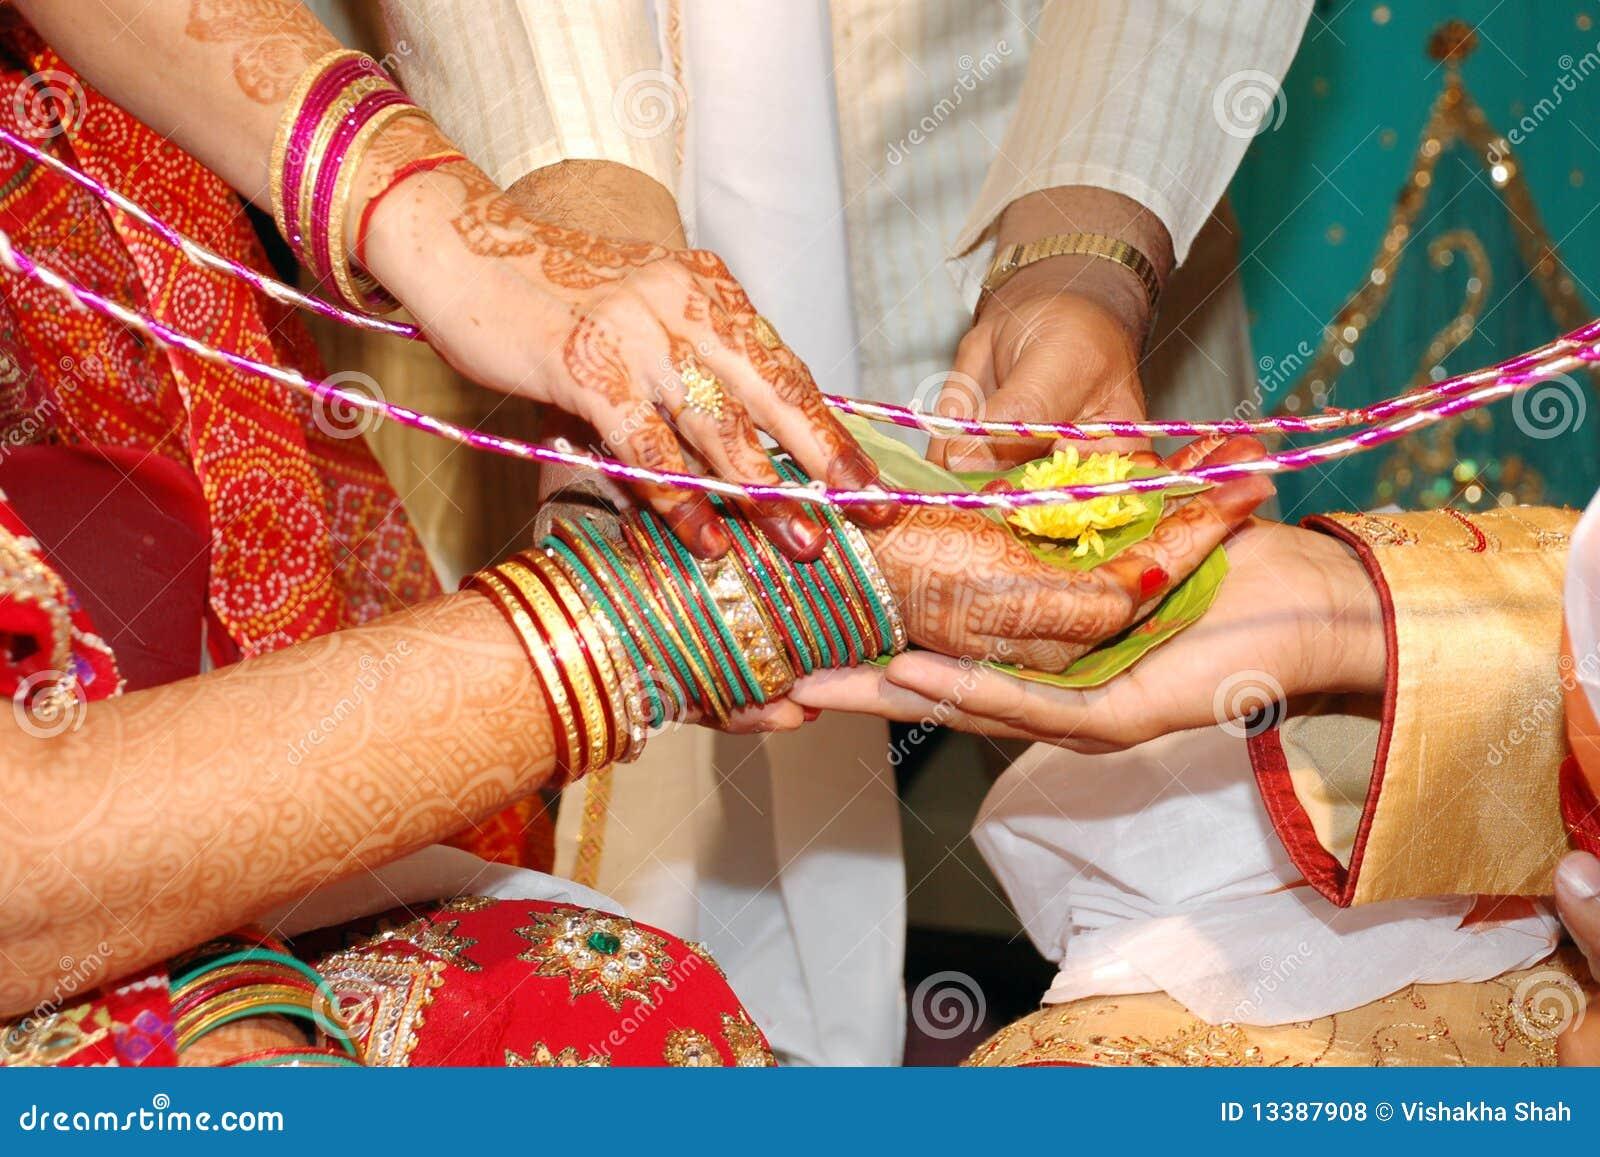 Indian Wedding Instrumental Songs Free Download